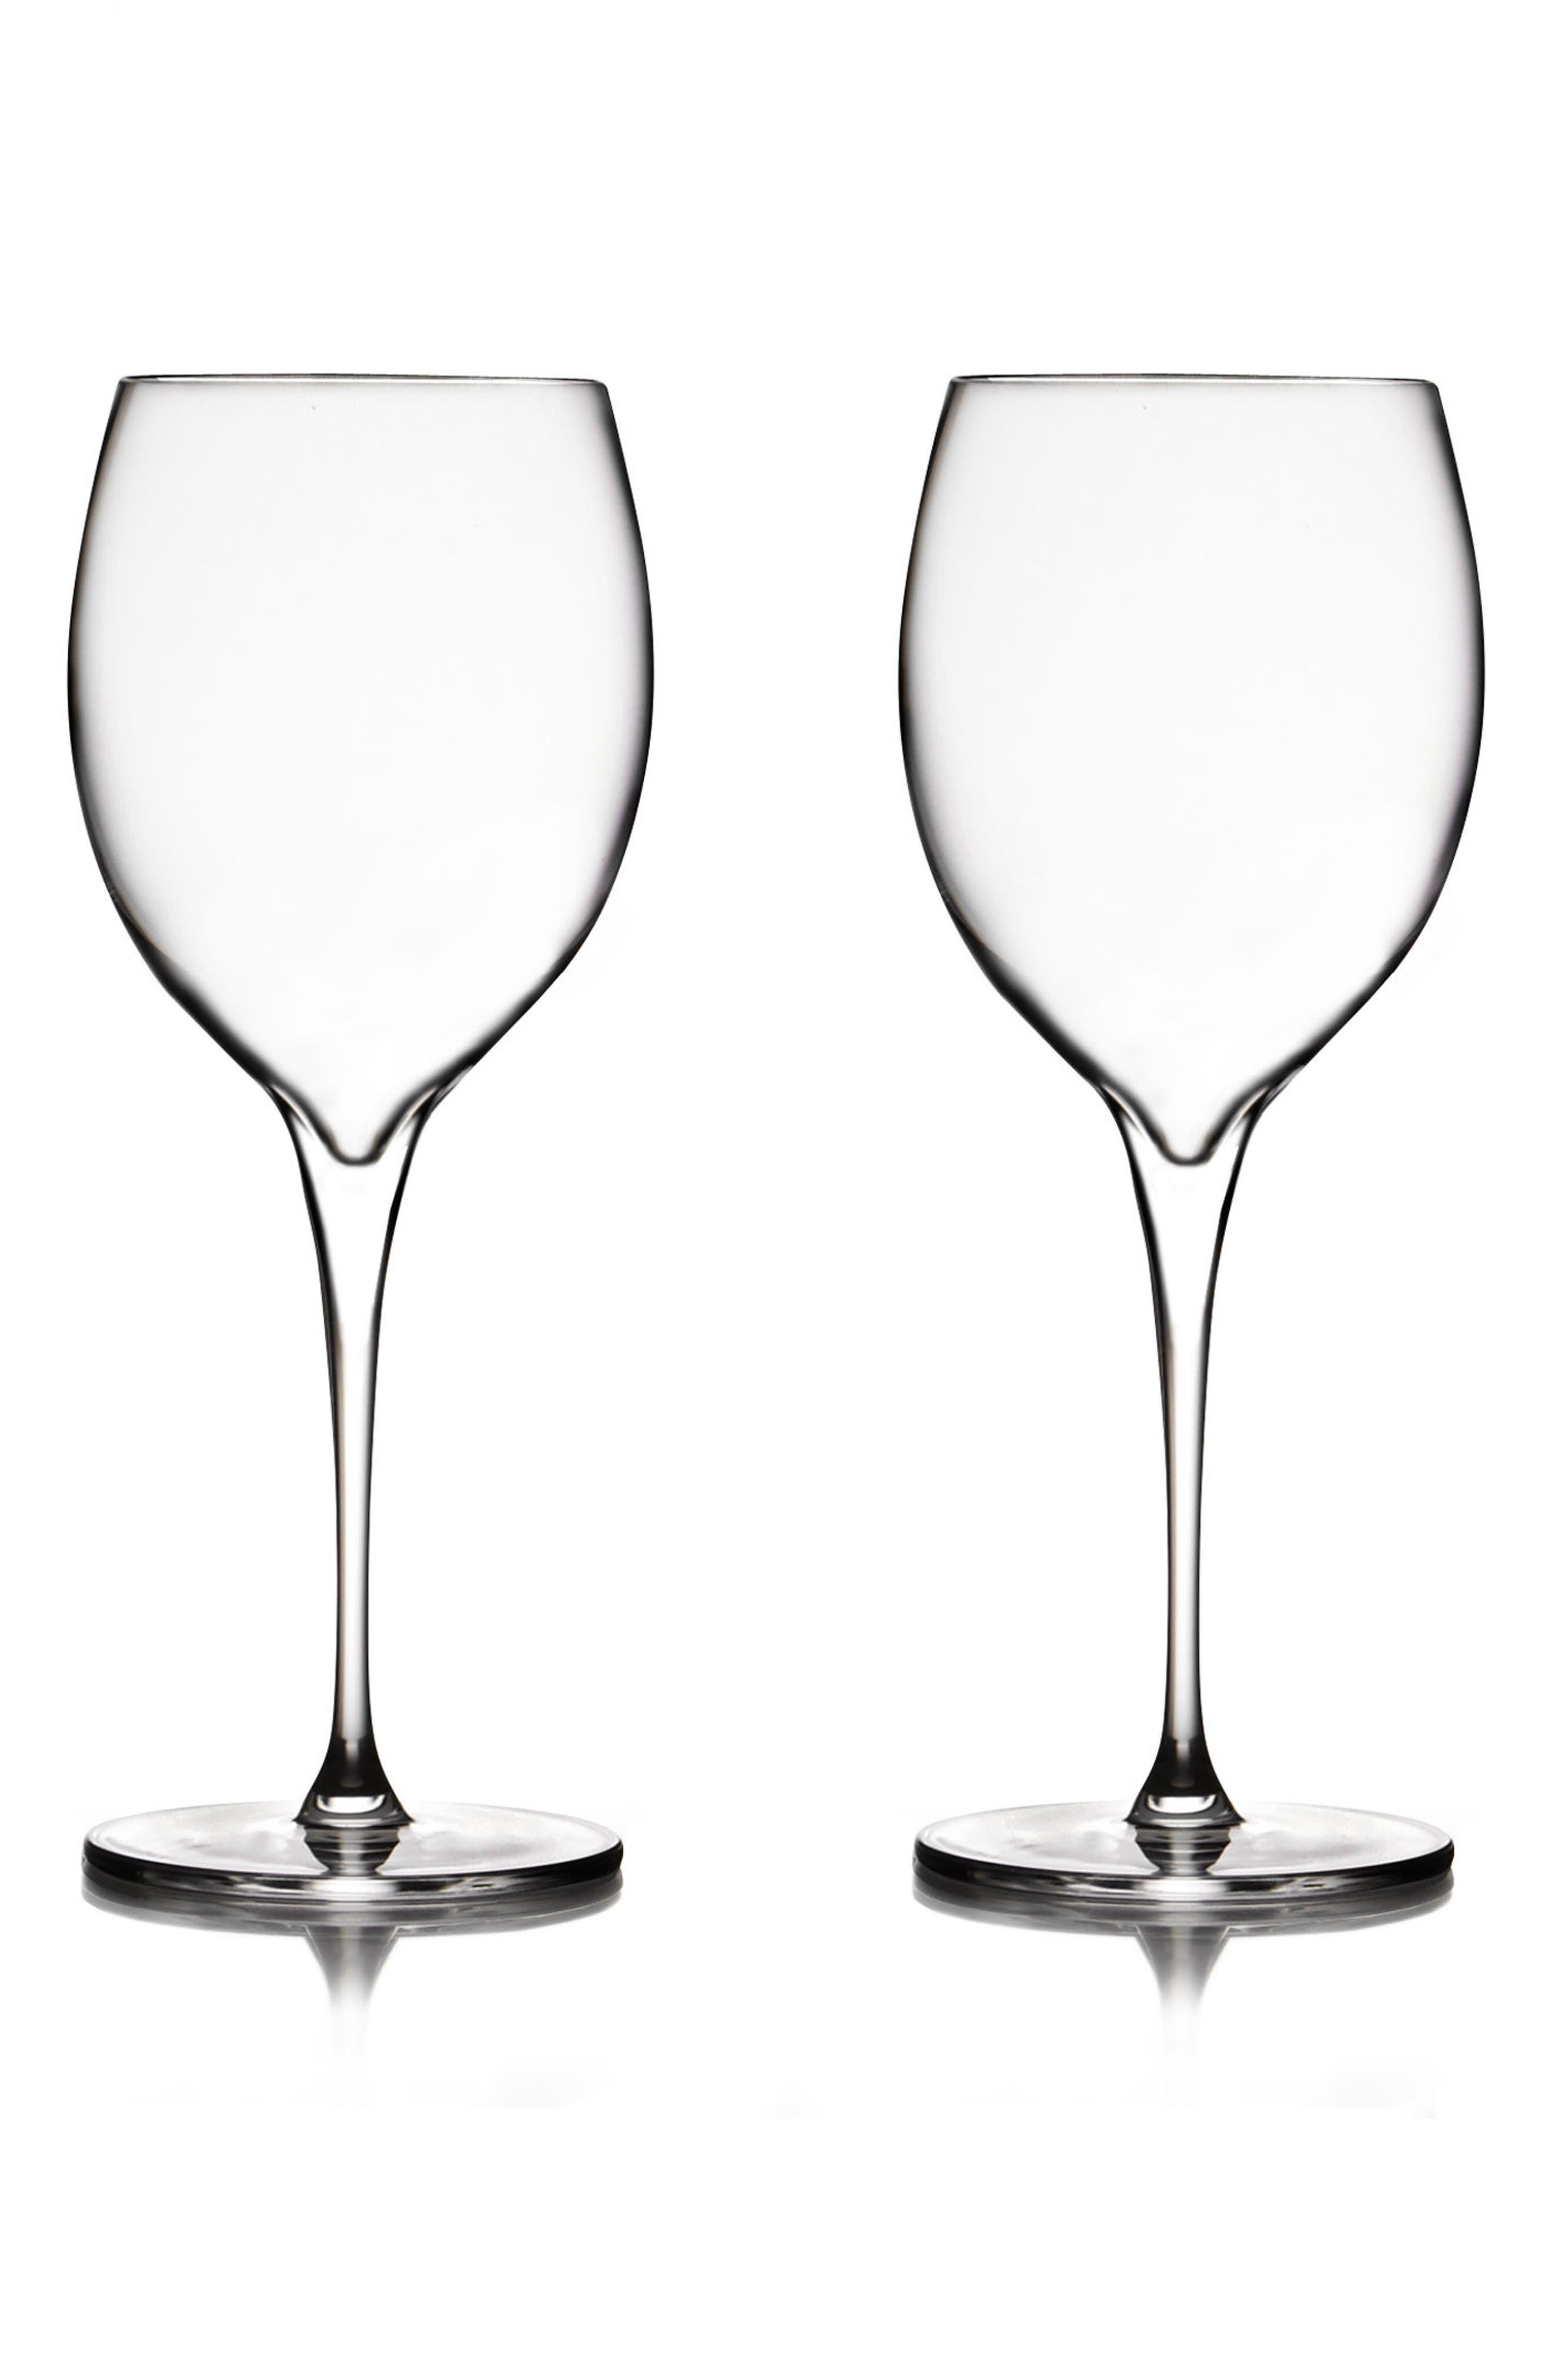 Main Image - Nambé Vie Set of 2 Chardonnay Glasses